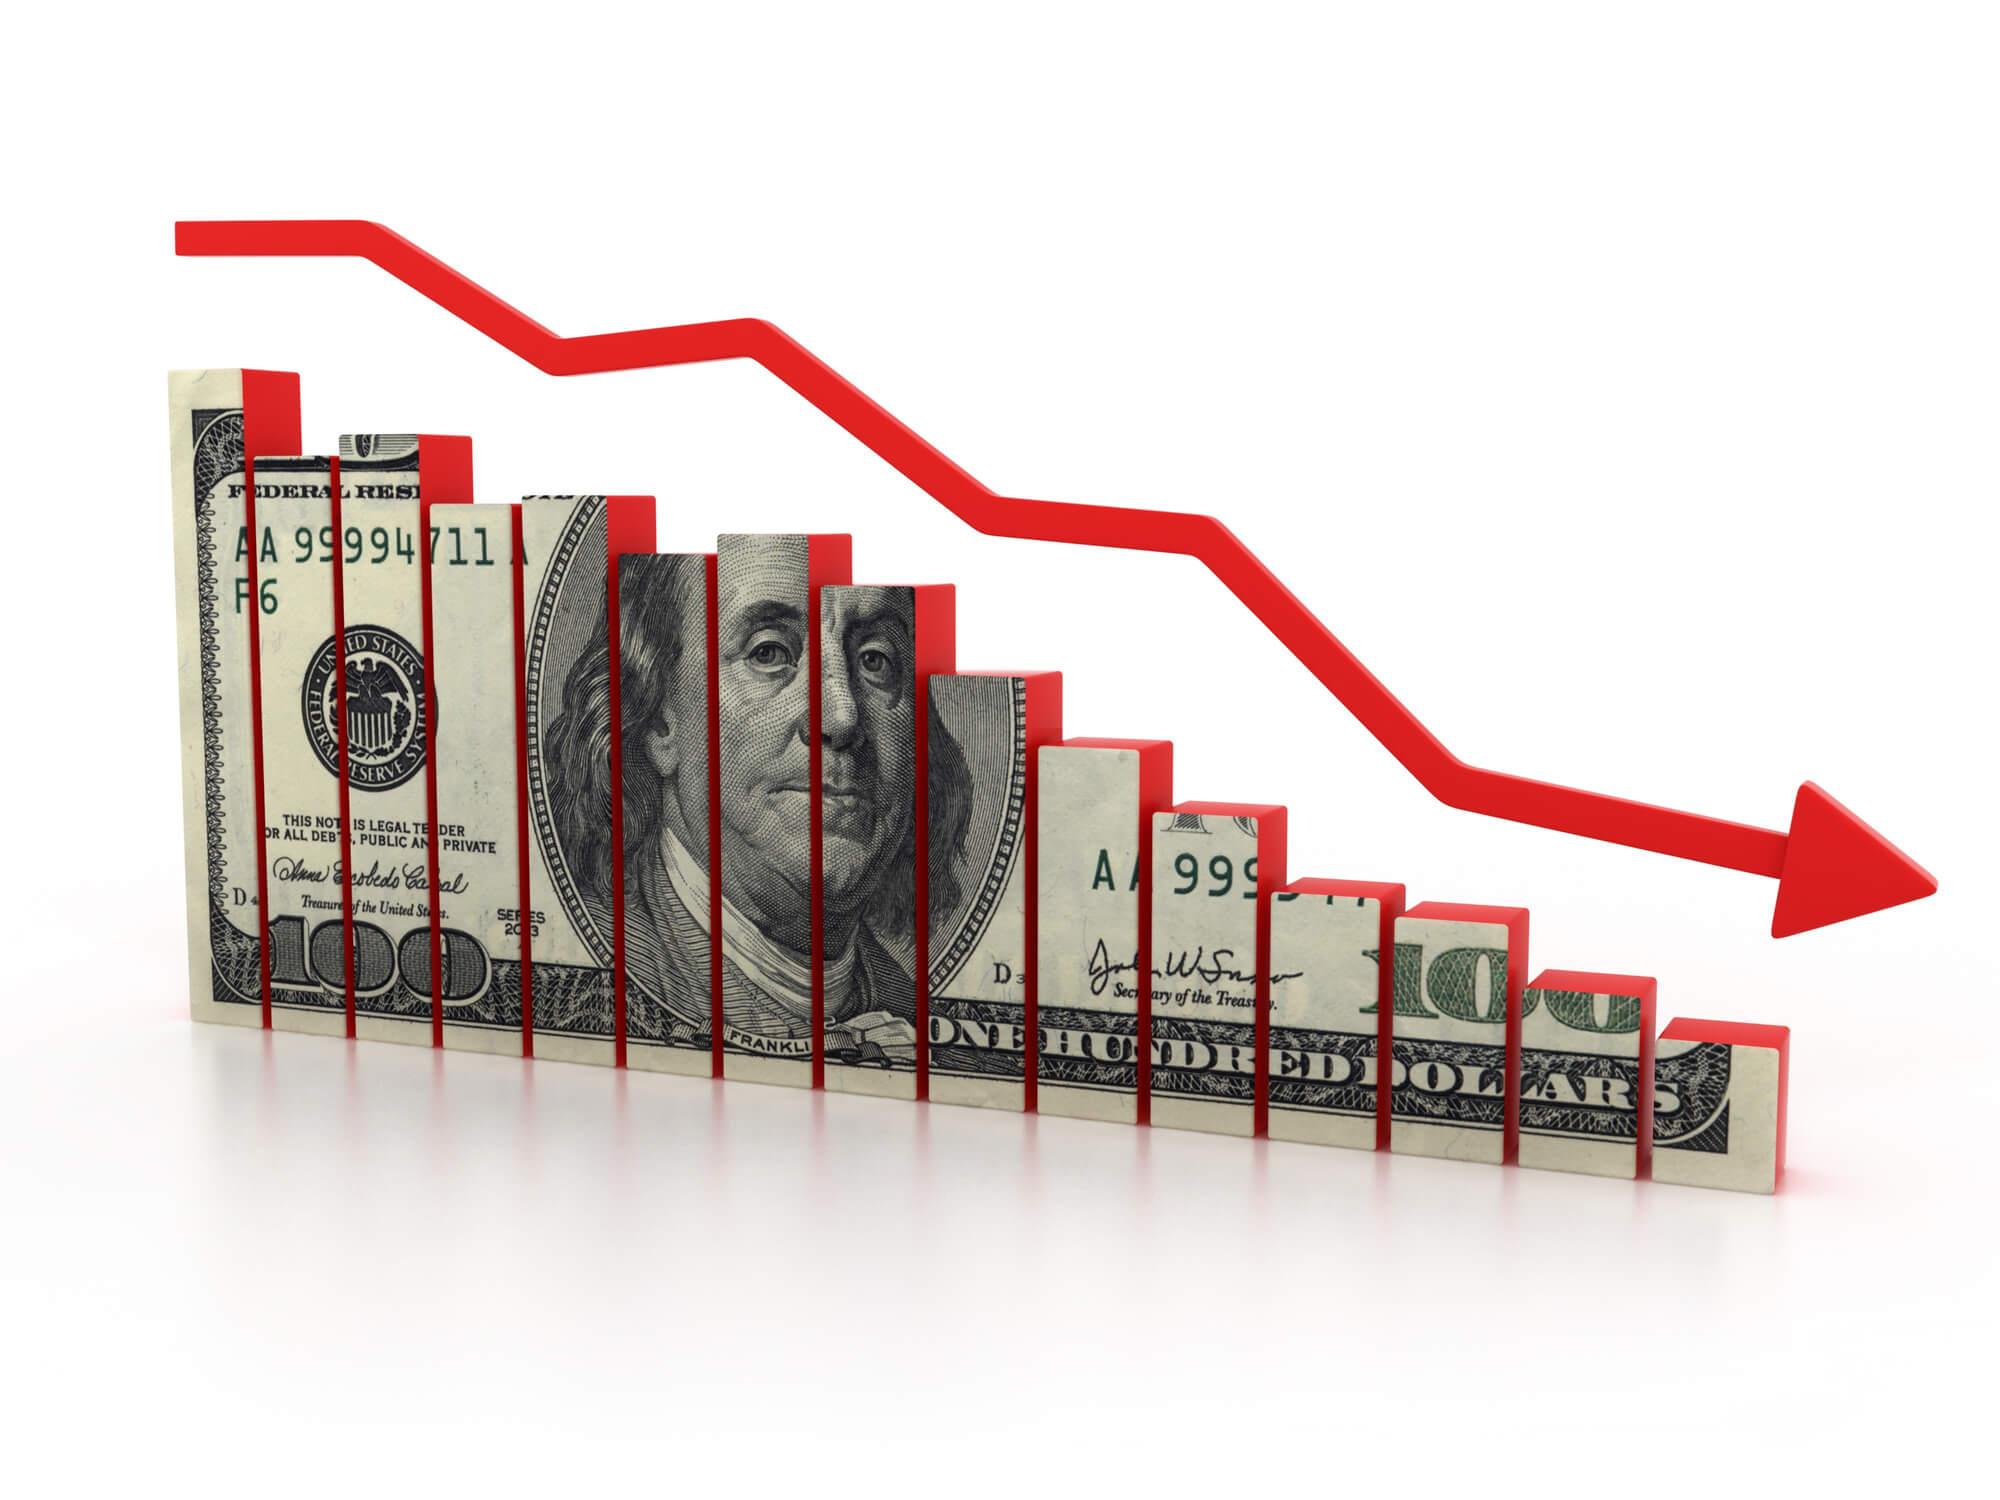 Inflation (dollar losing value)